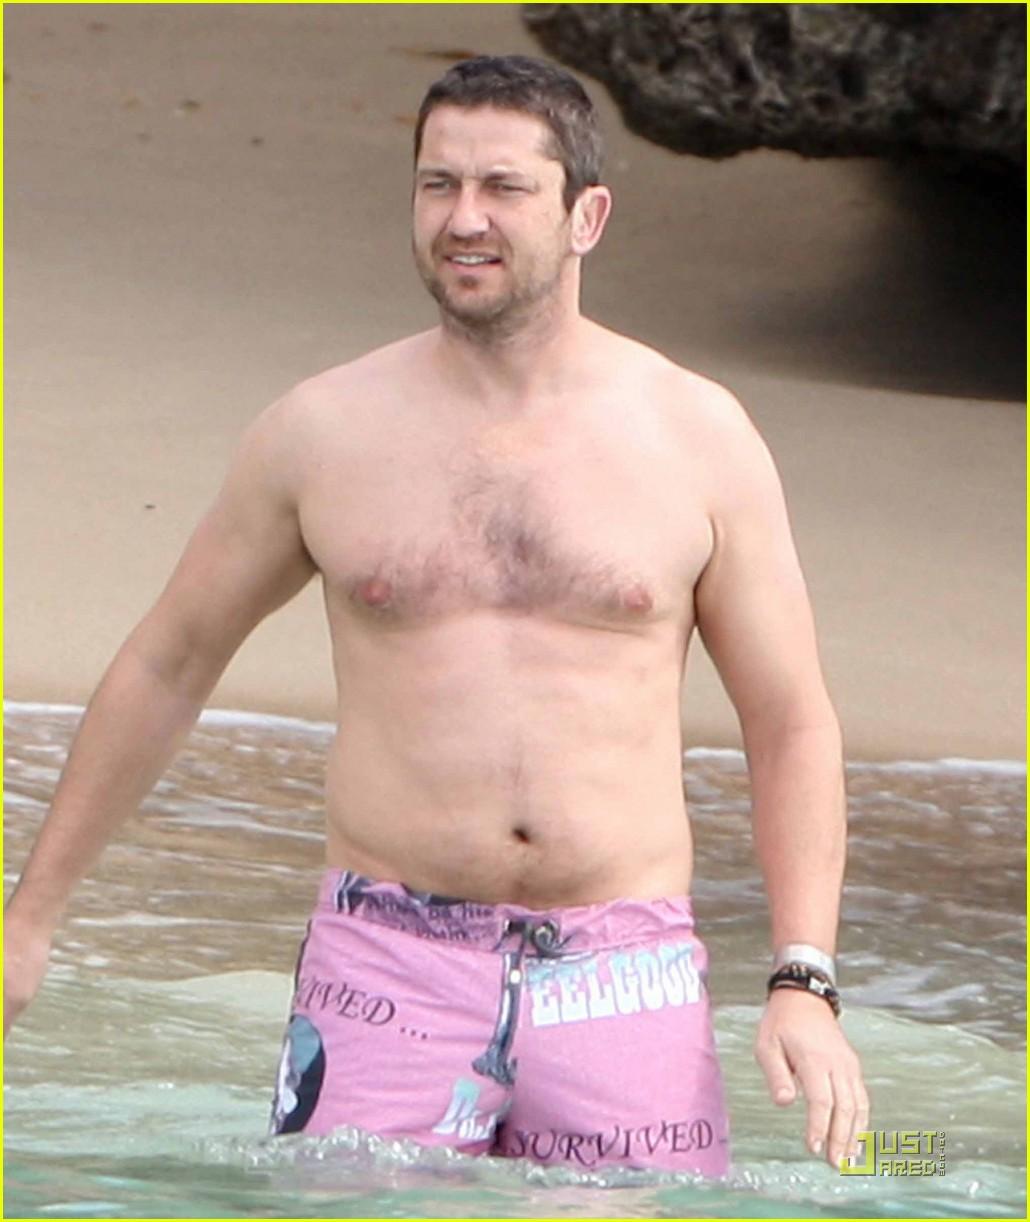 http://2.bp.blogspot.com/_AJWbjEZ26RM/S0JIvfNgatI/AAAAAAAAOuo/-dvWSu8CuAw/s1600/gerard-butler-shirtless-barbados-04.jpg